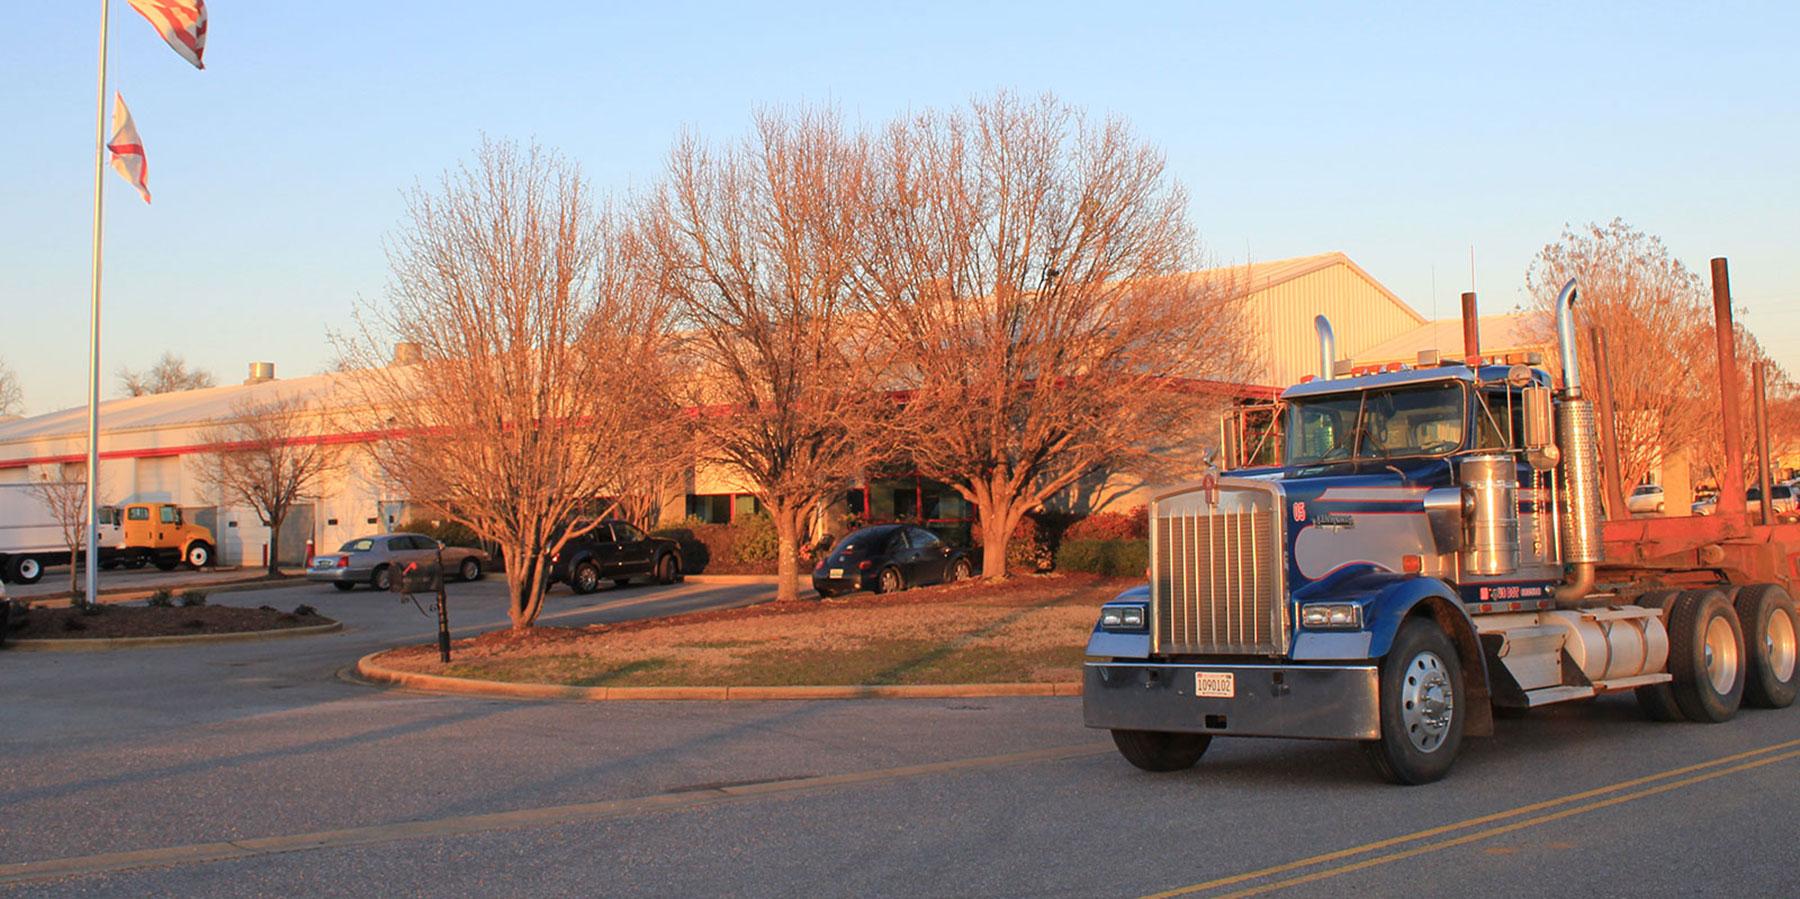 Used Light Duty Trucks